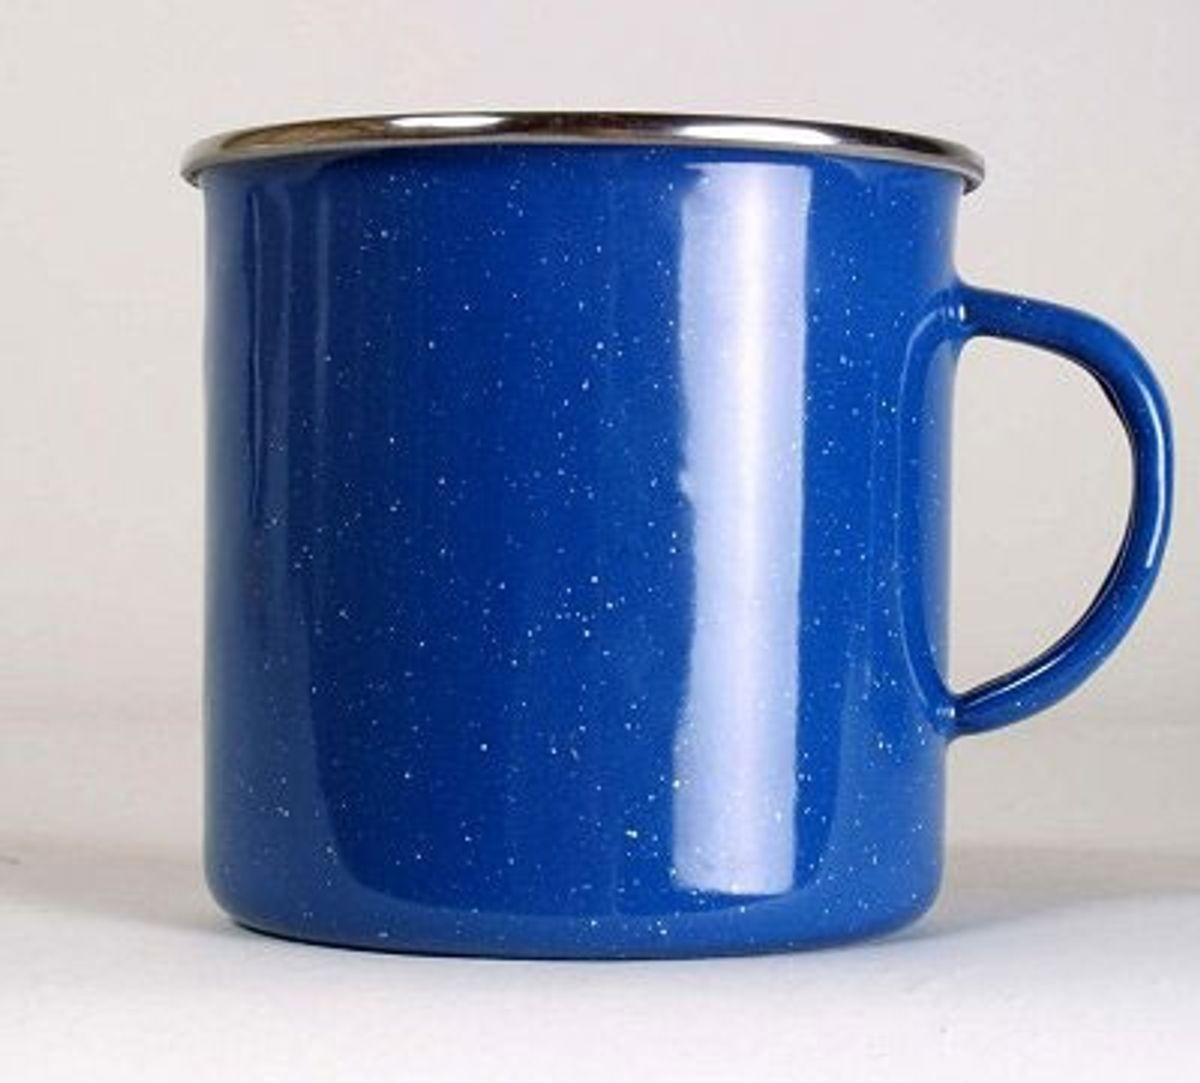 Relags Emaille Tasse, 530 ml, blau